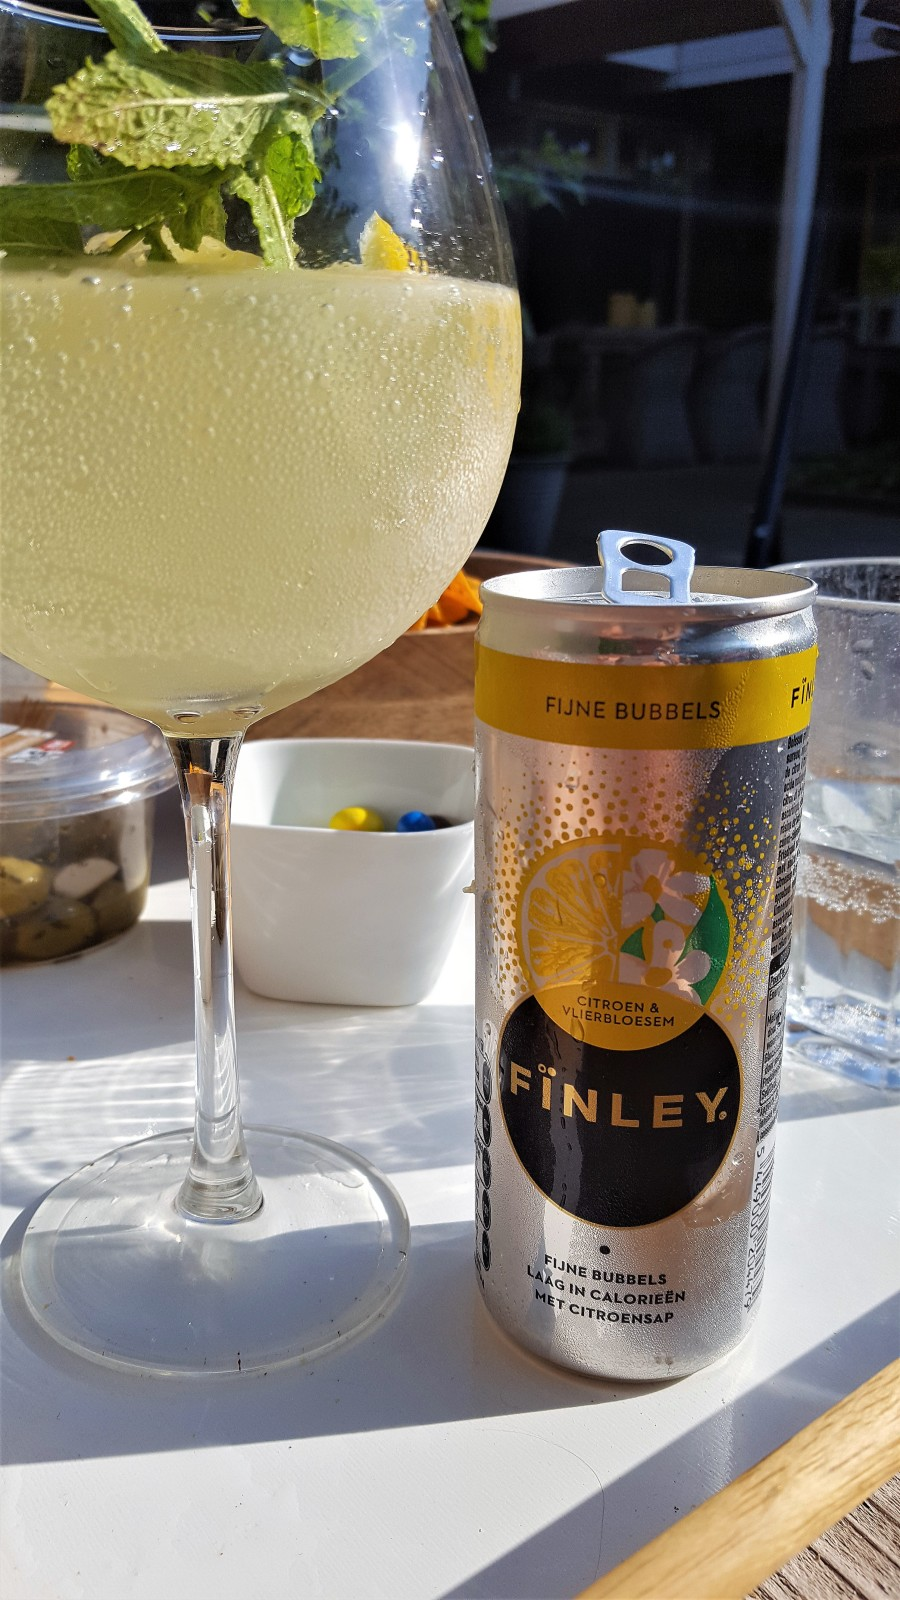 Alcoholvrij_finley_2